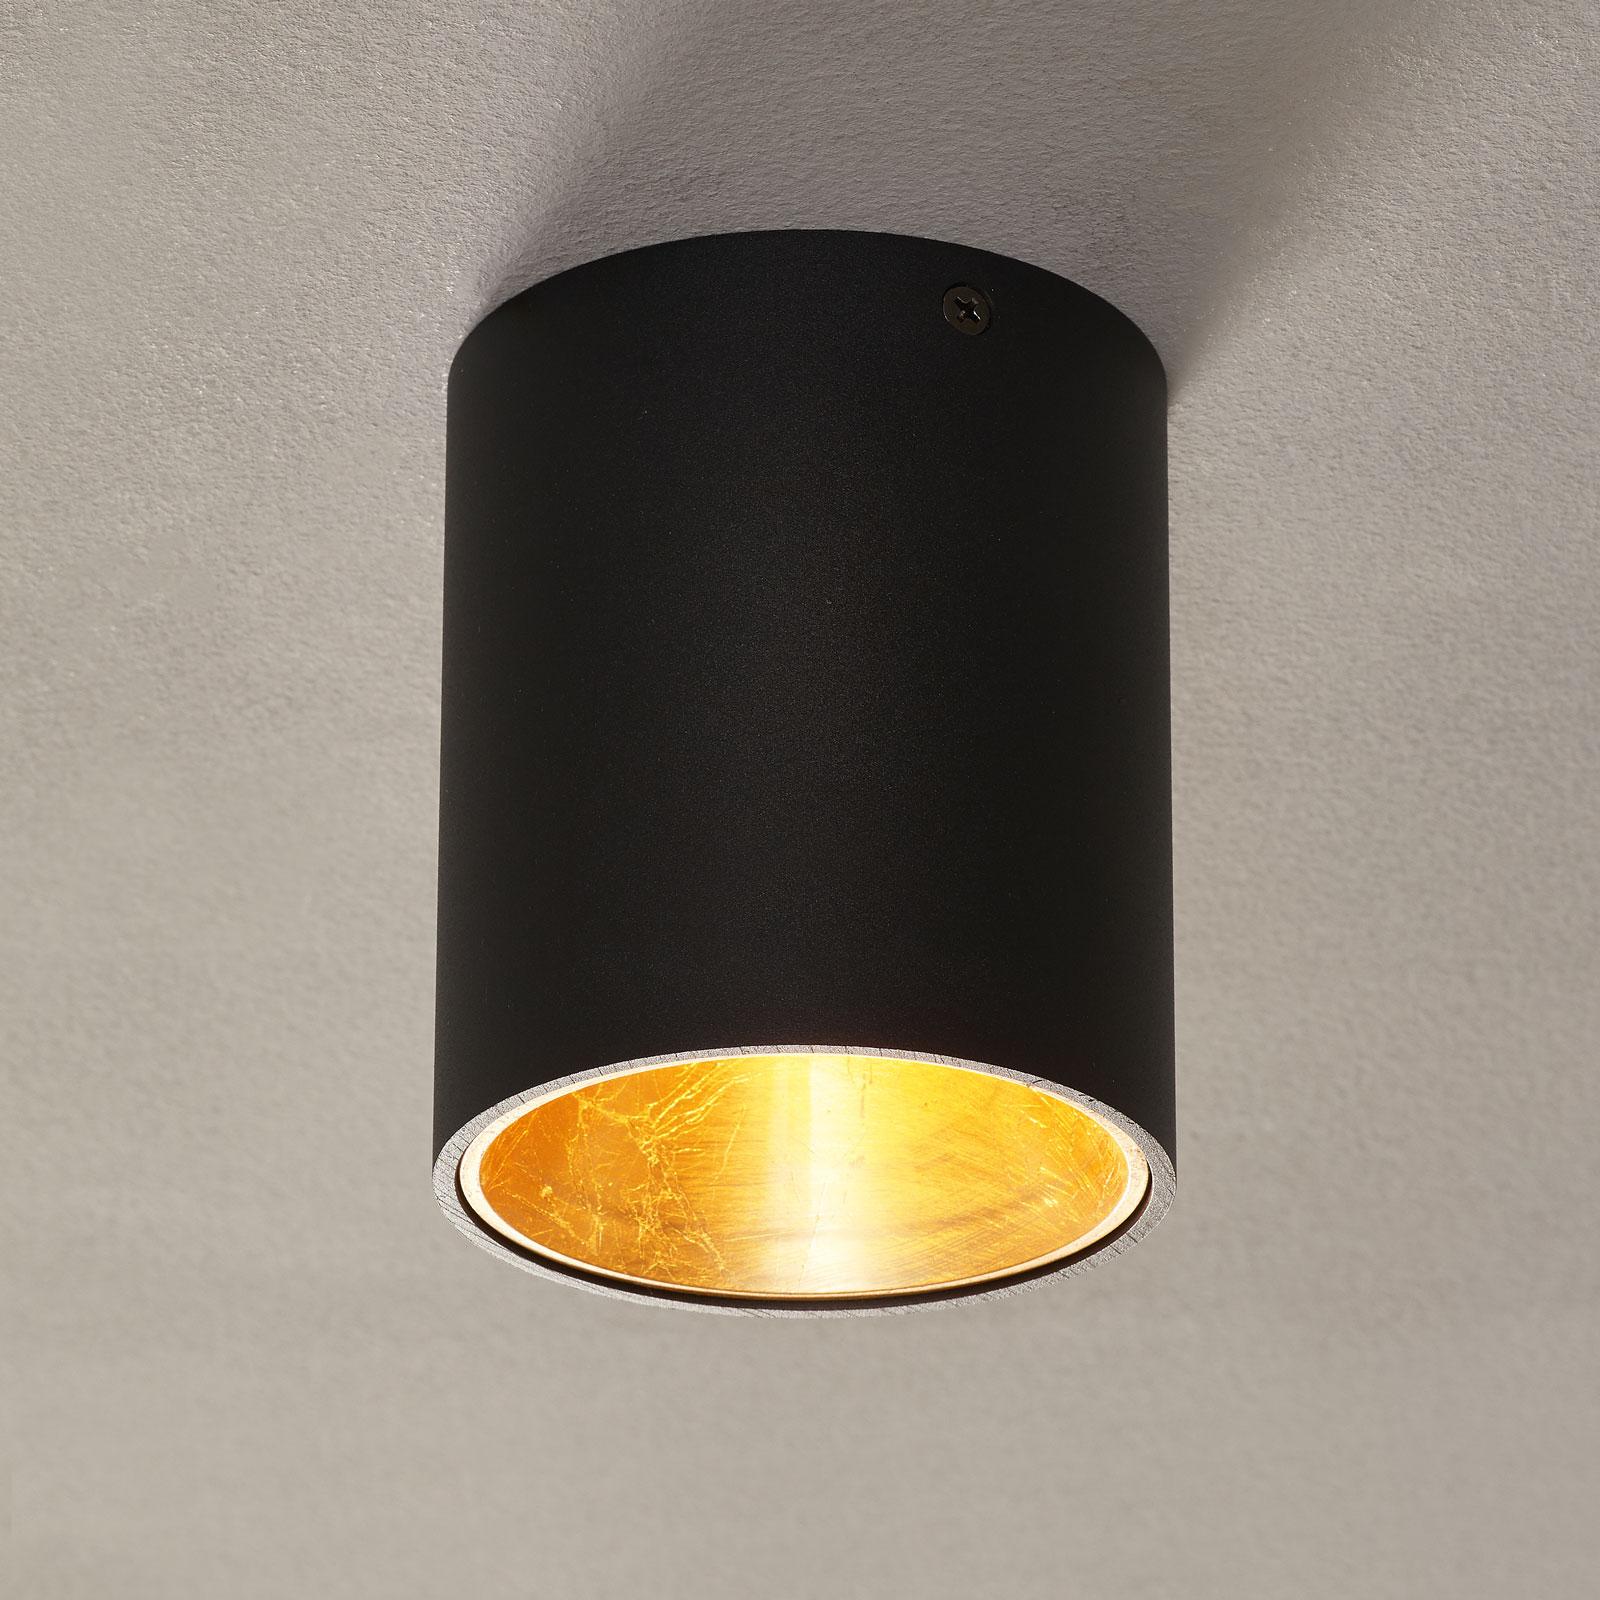 LED-taklampe Polasso rund, svart-gull